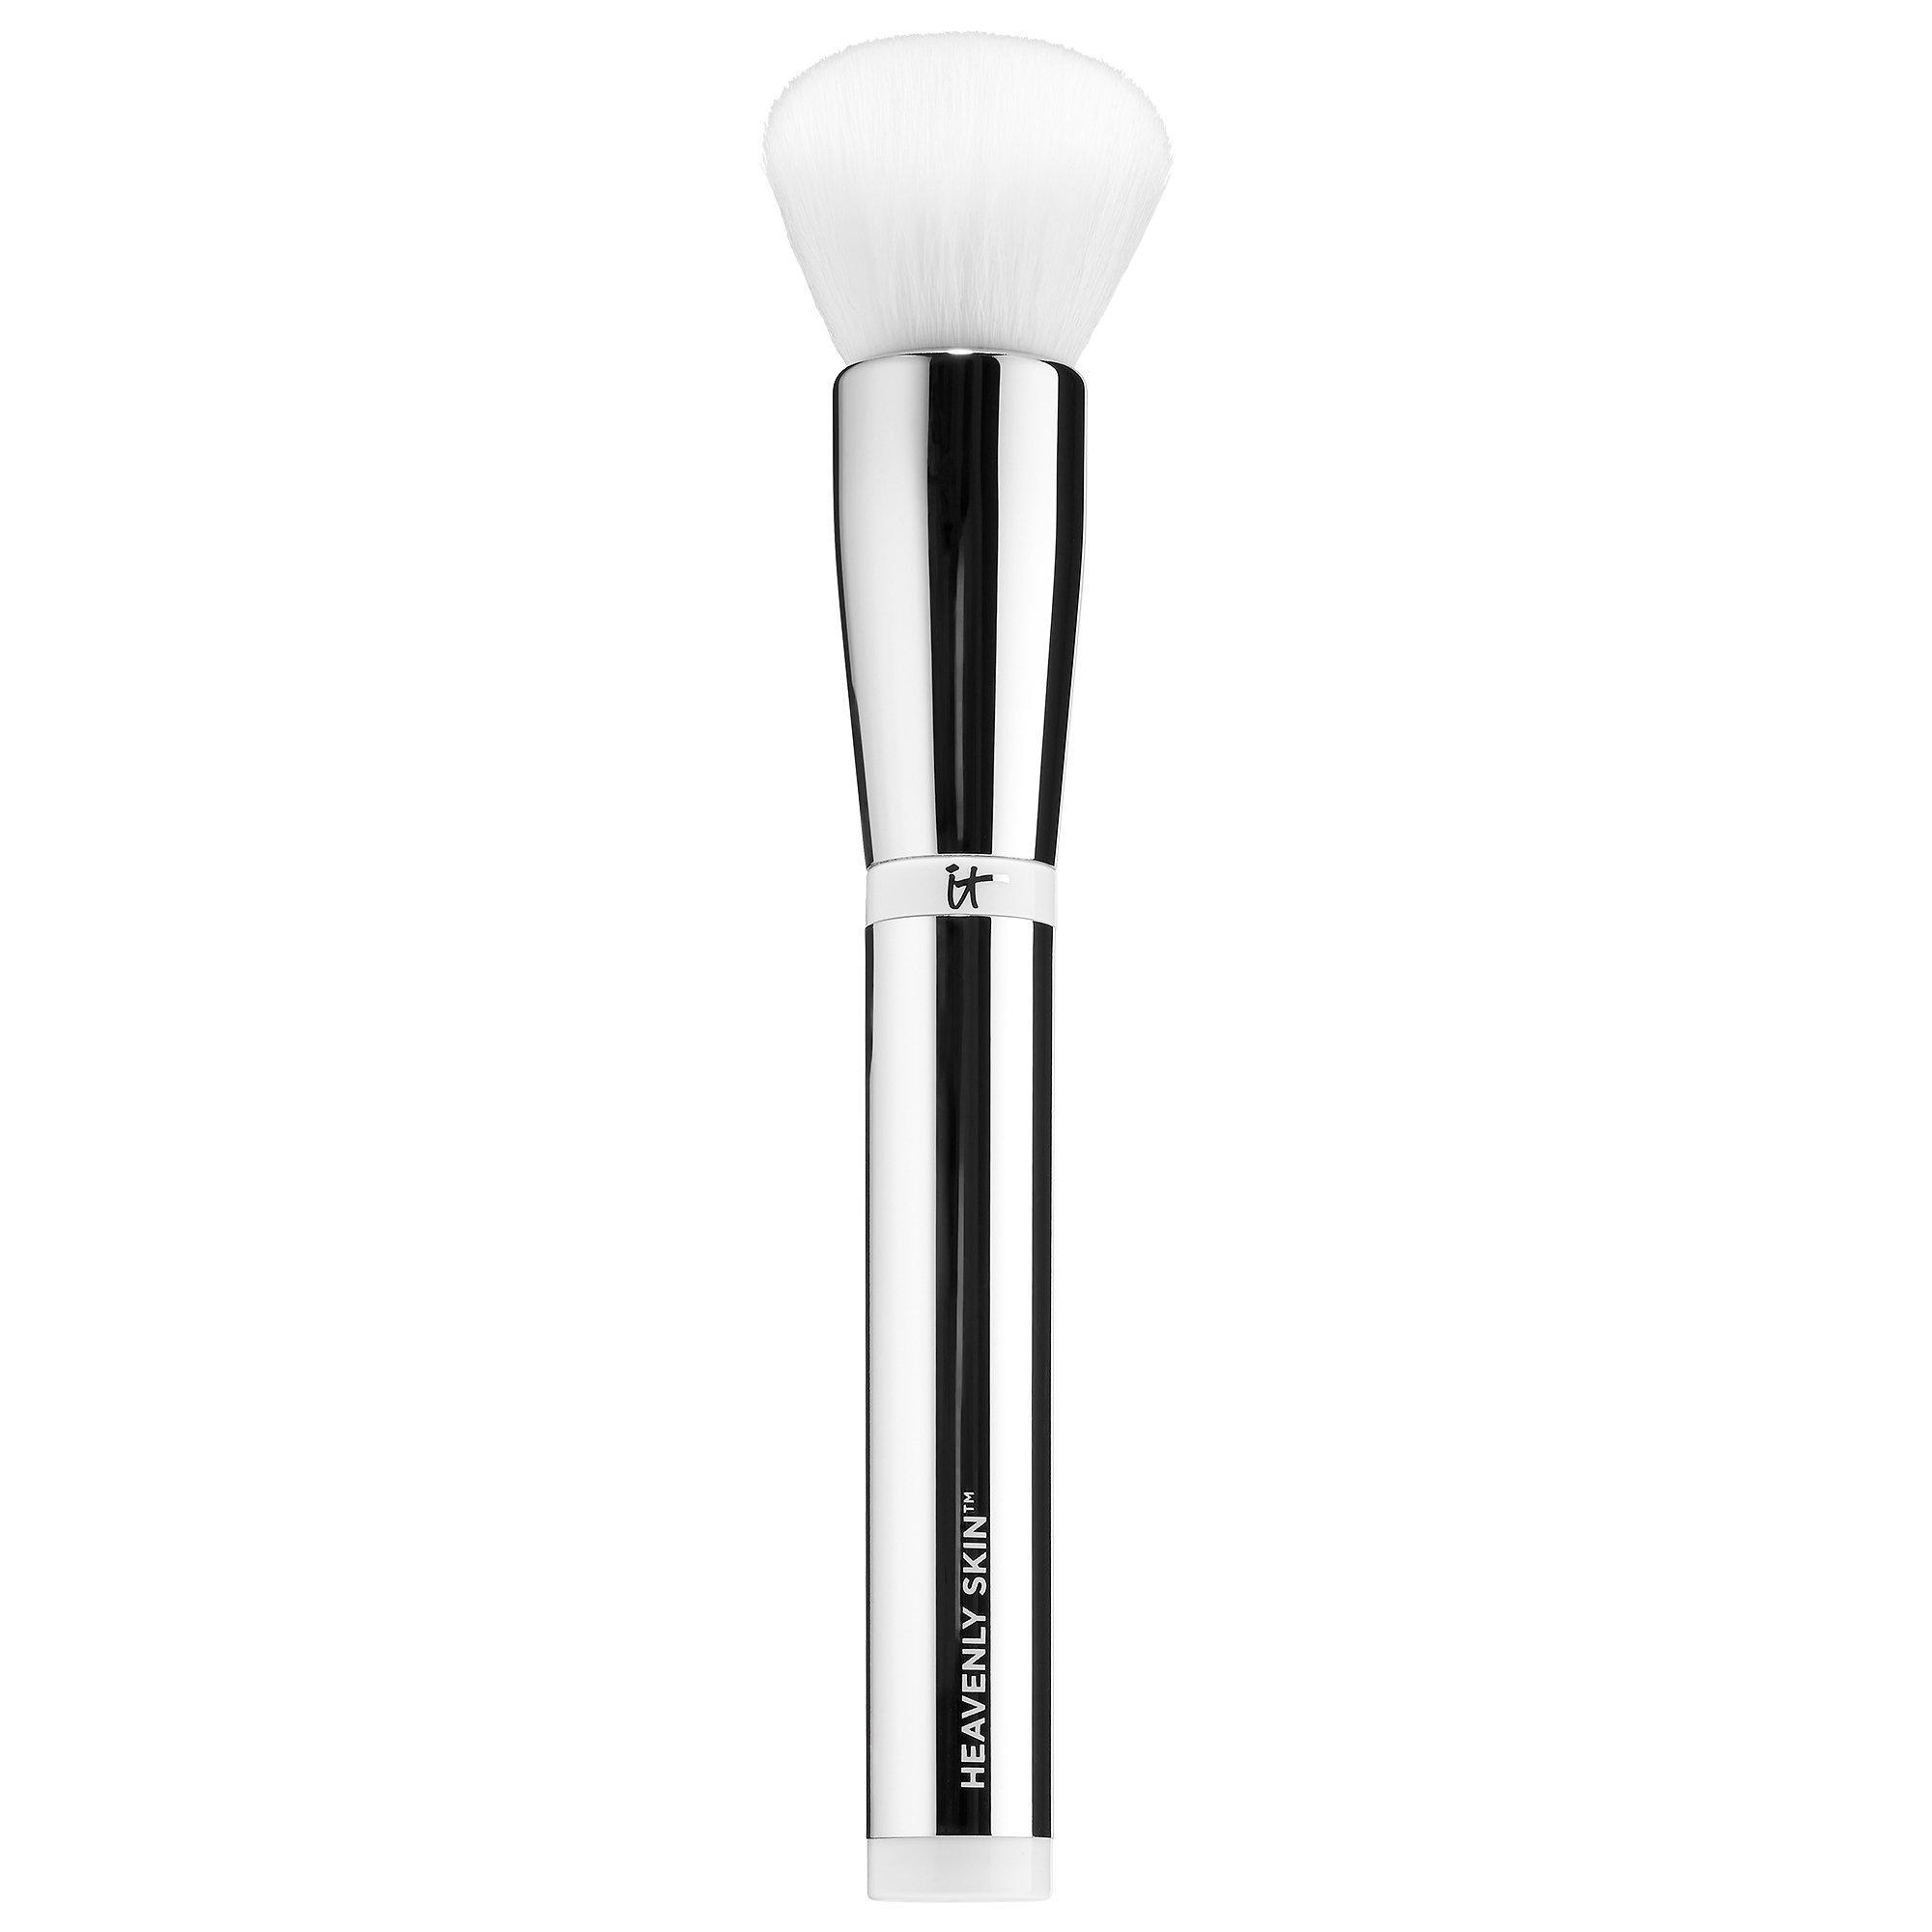 IT Cosmetics Heavenly Skin CC+ Skin-Perfecting Brush 702